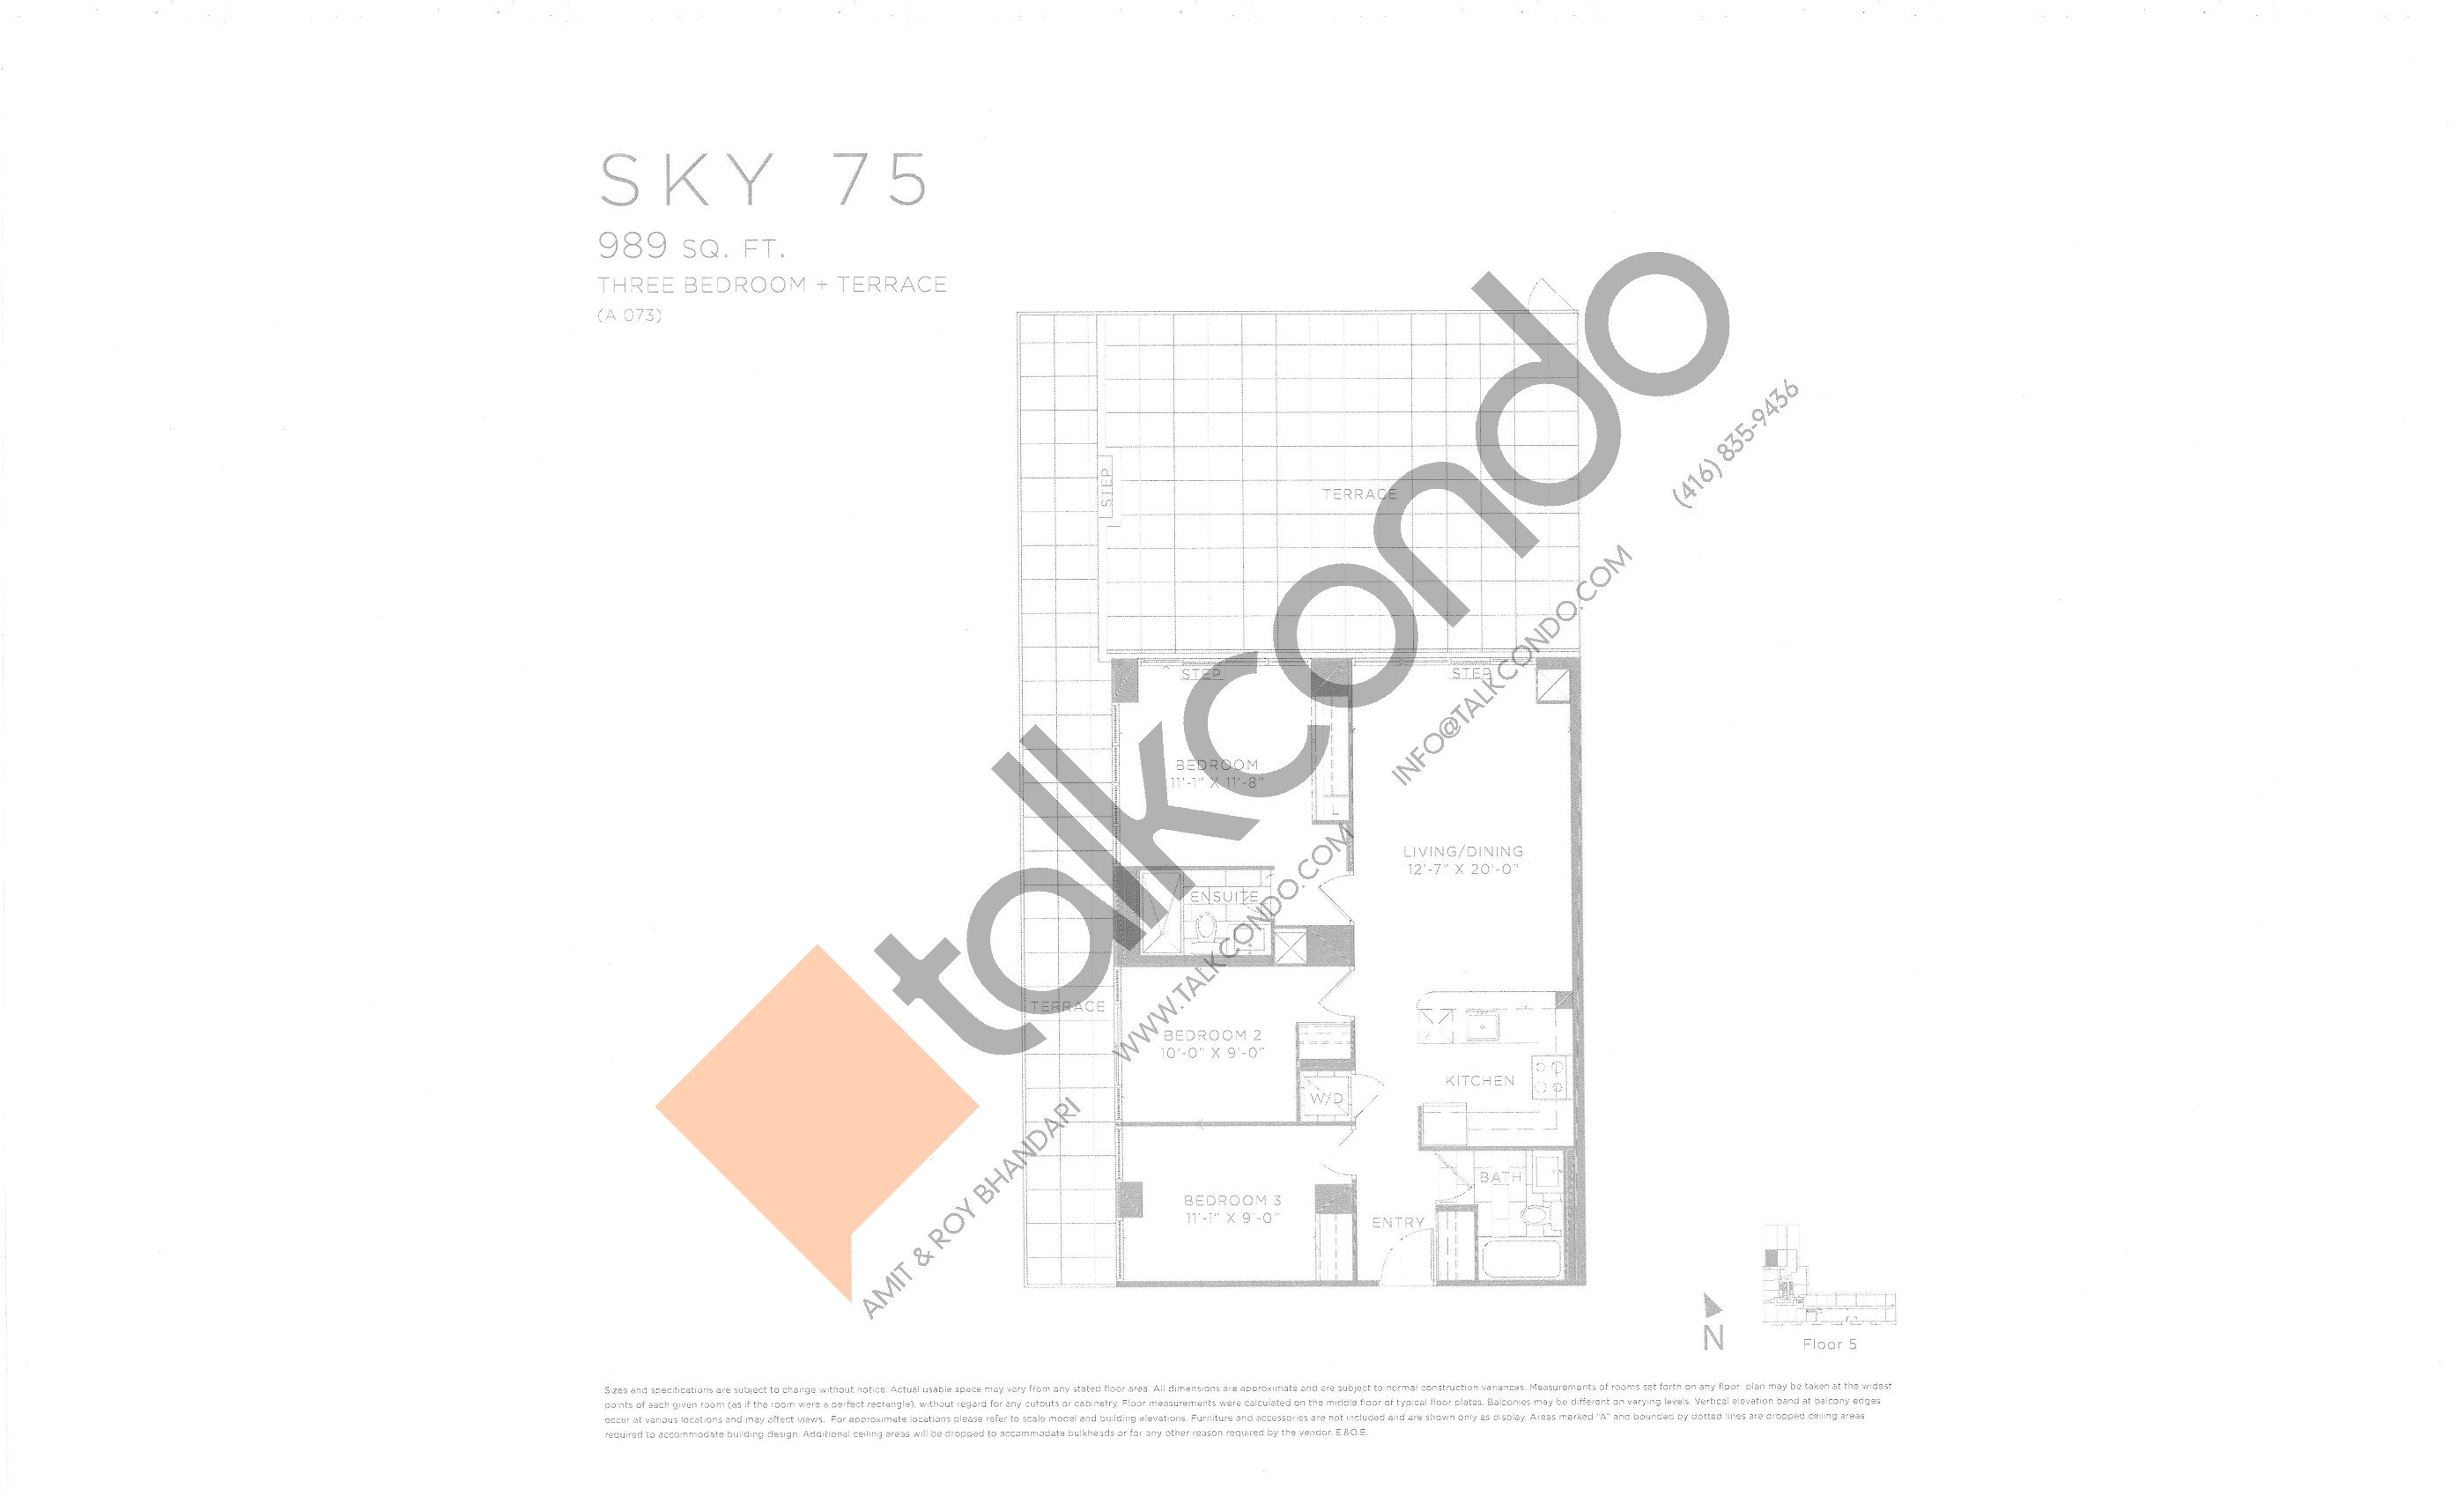 Sky 75 Floor Plan at Eau Du Soleil Condos - 989 sq.ft